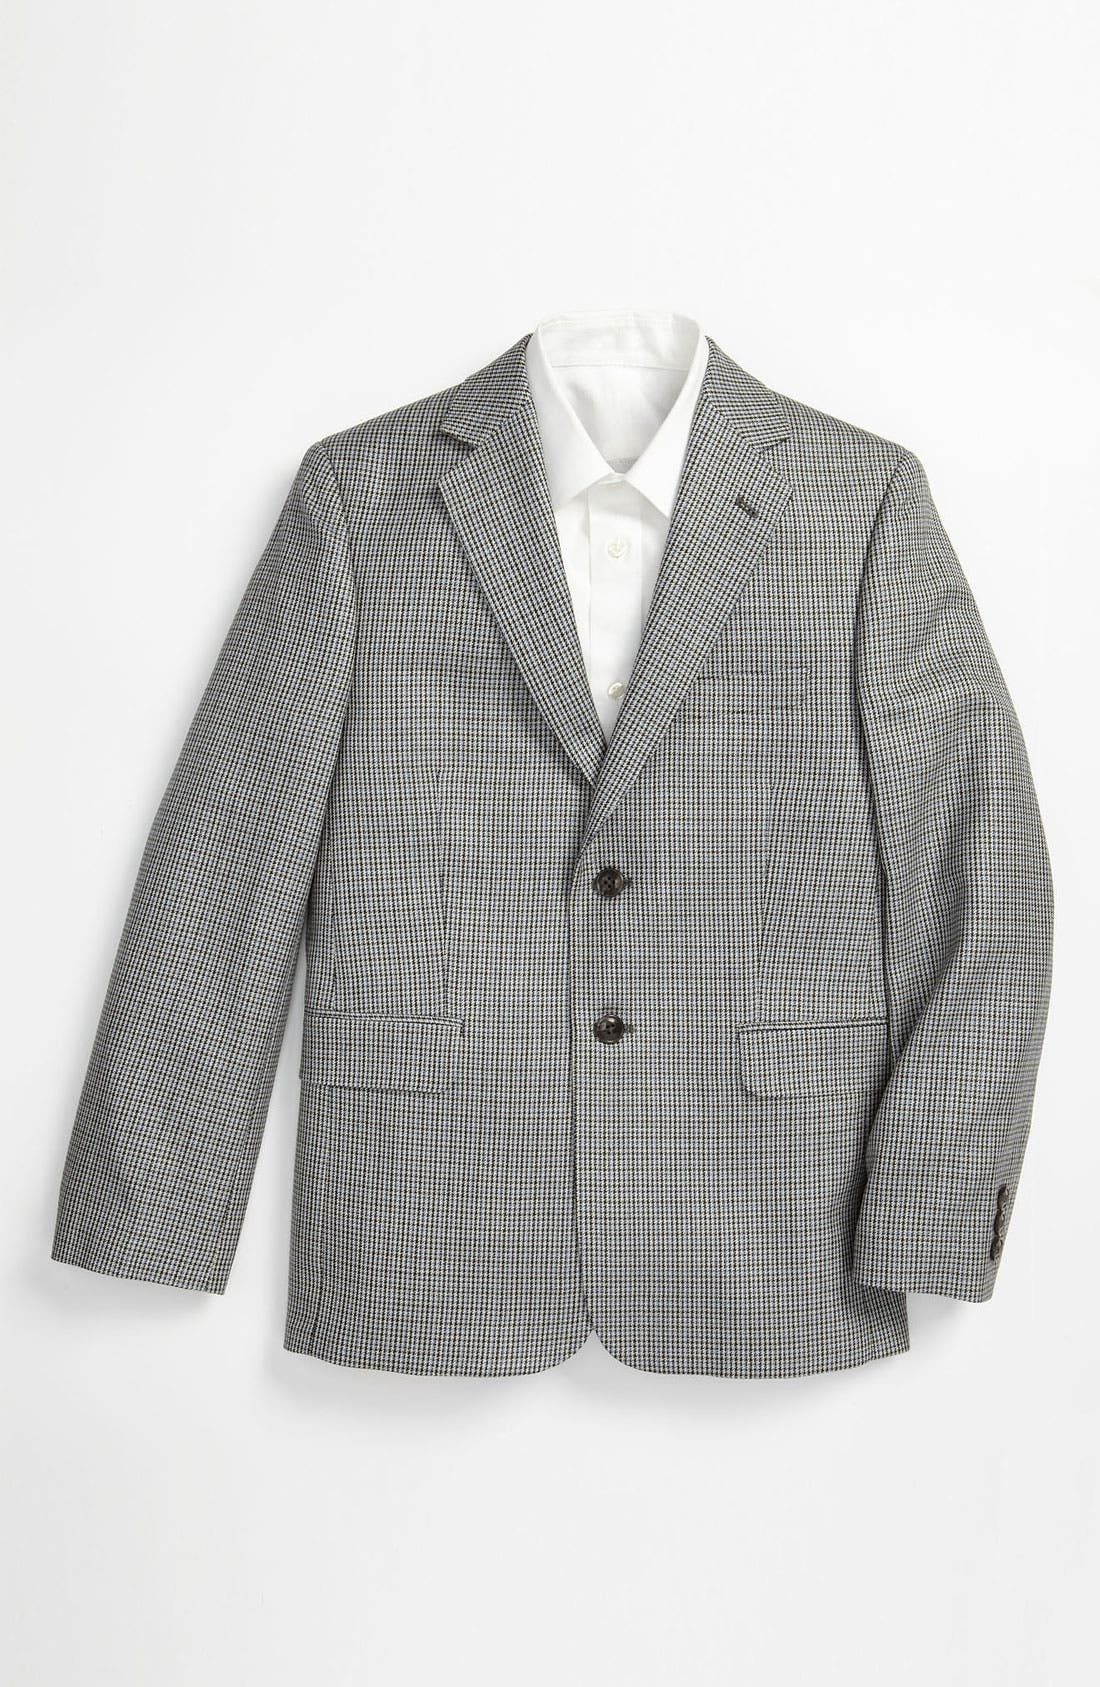 Alternate Image 1 Selected - Joseph Abboud Houndstooth Sportcoat (Big Boys)